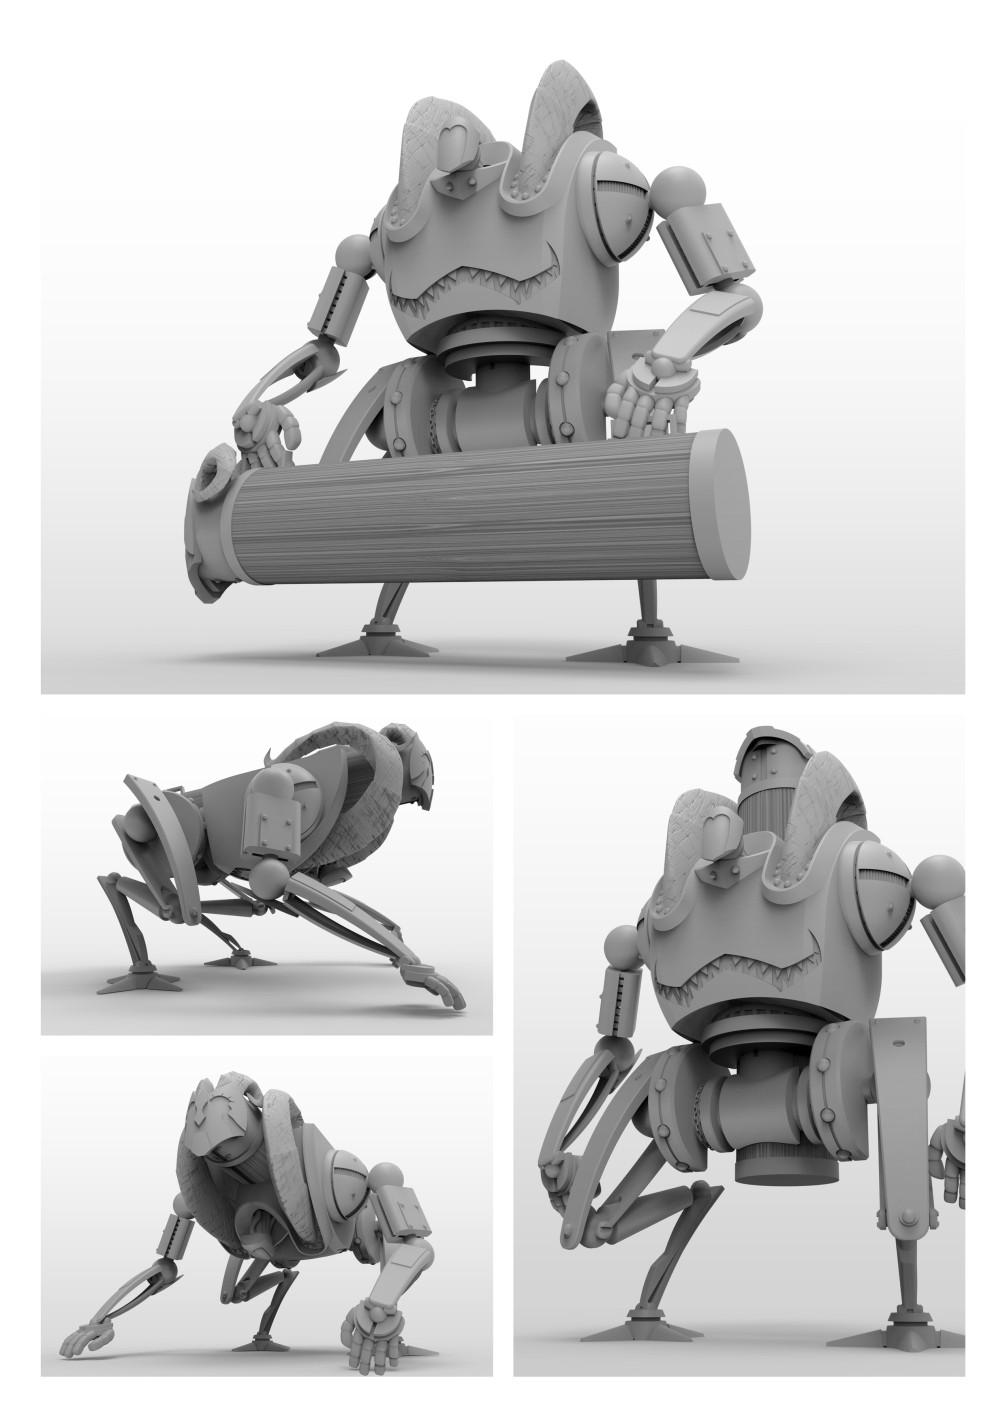 Robot Ariete - Elaborazioni 3D - Daniele Cattarin